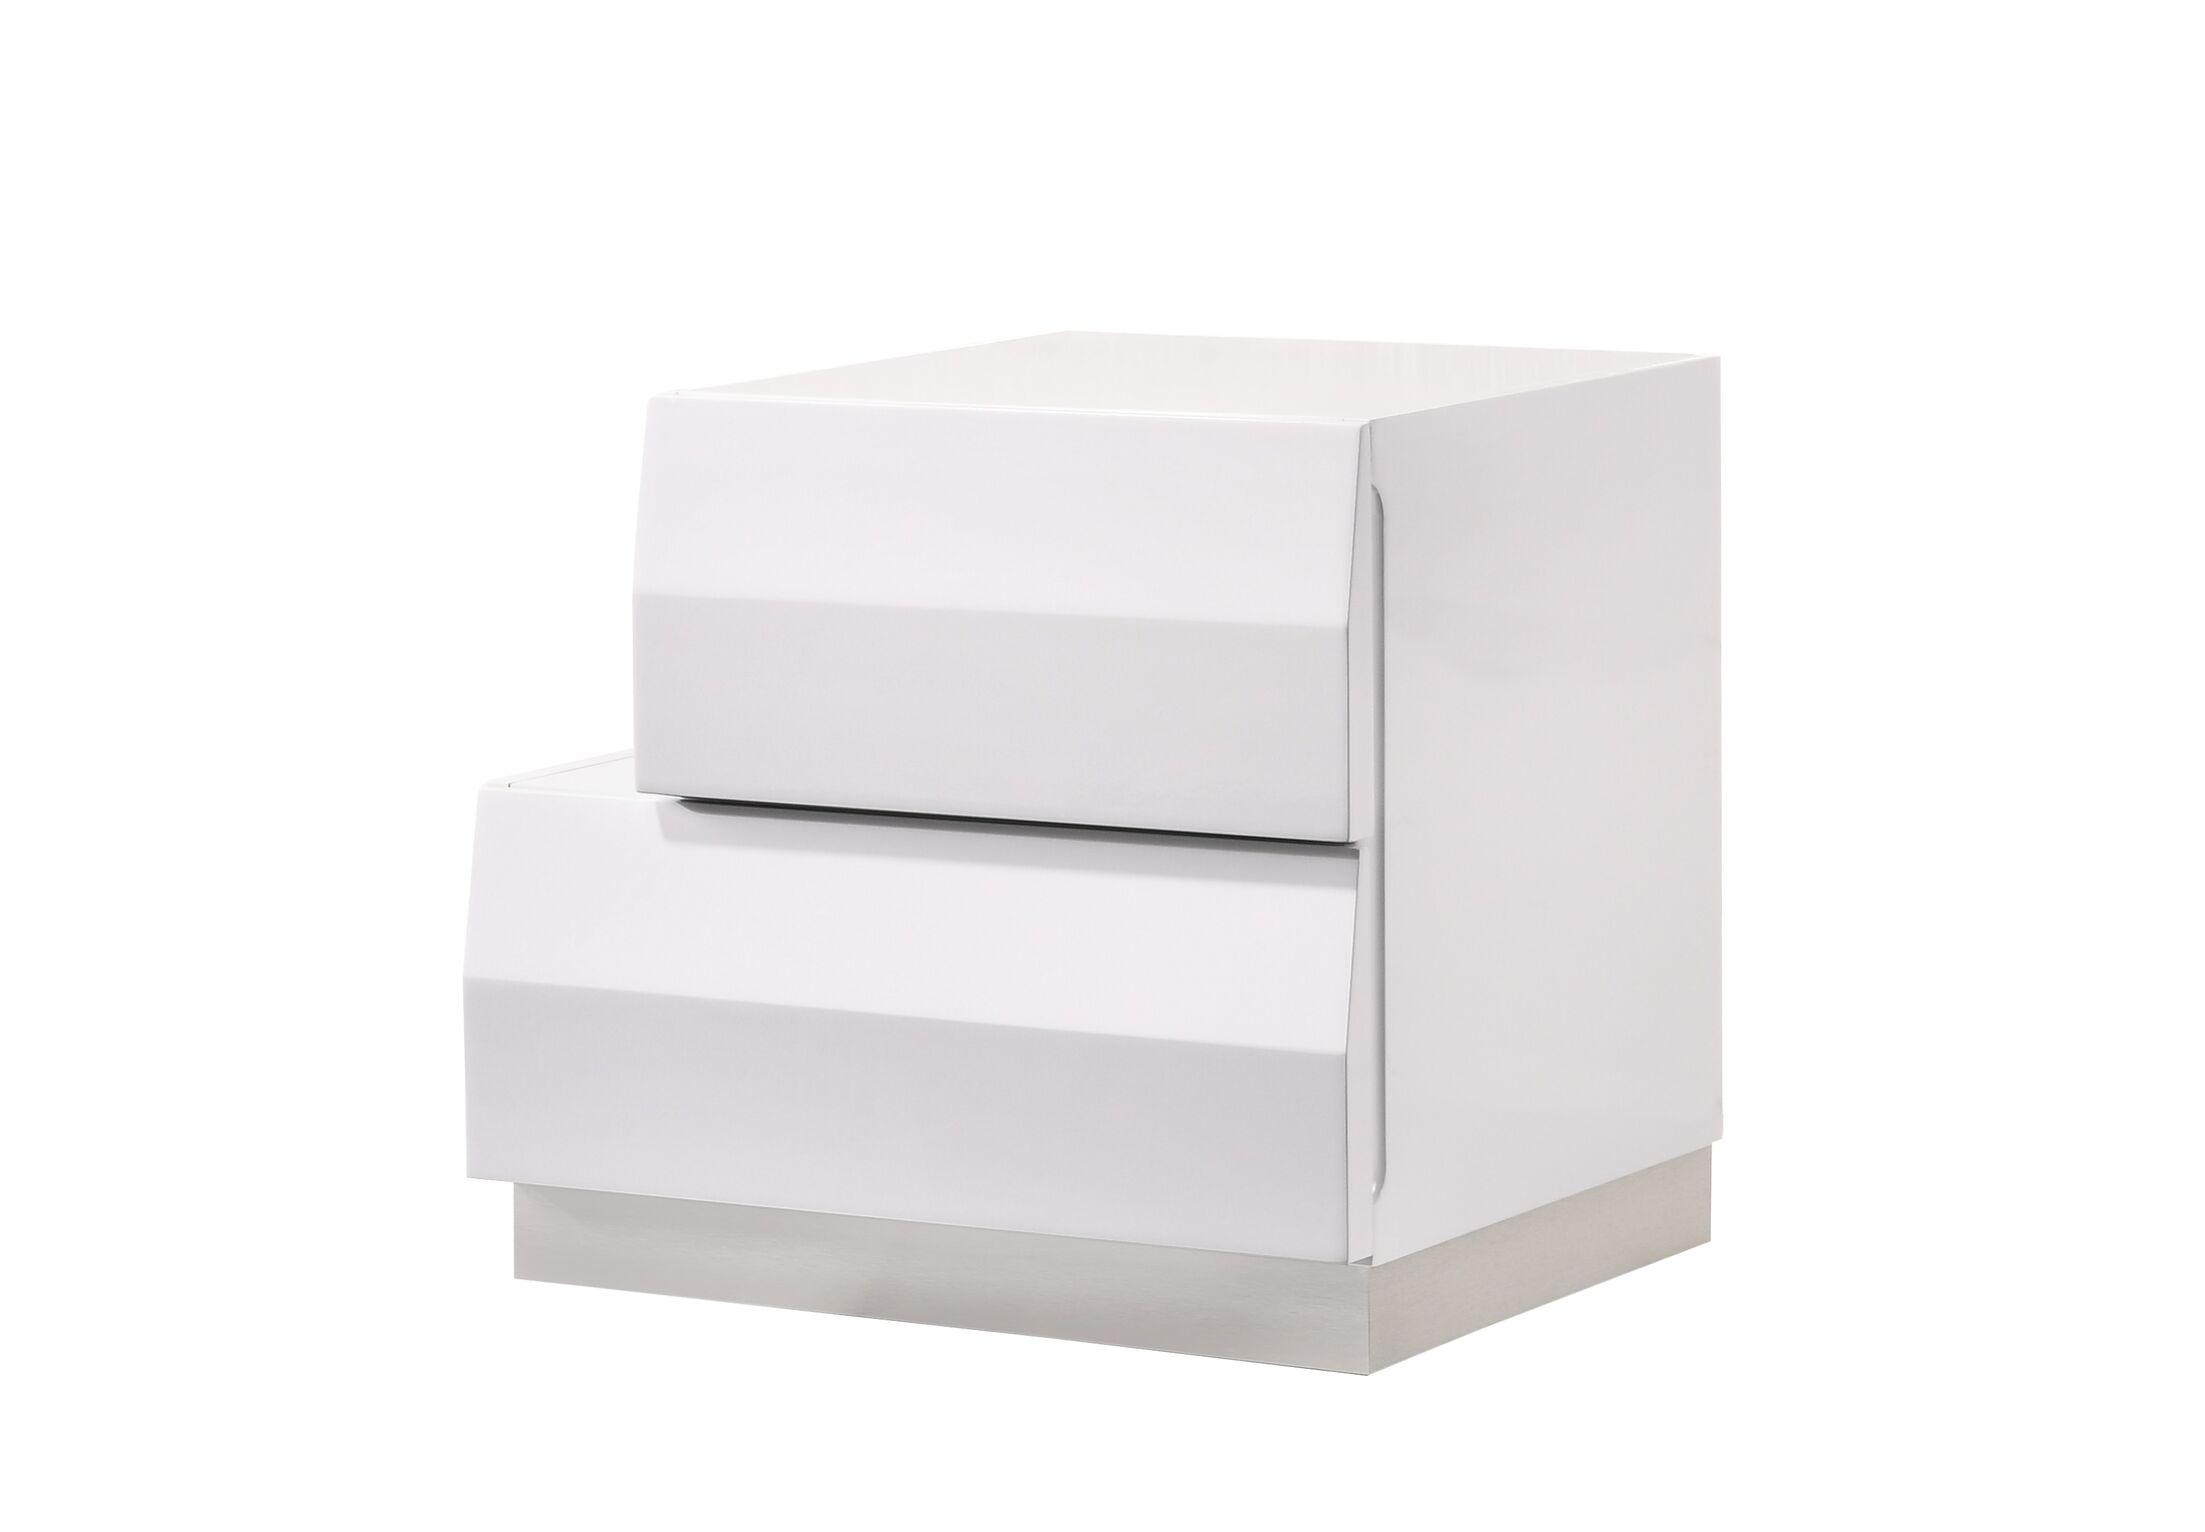 Matt 2 Drawer Nightstand Color: White, Orientation: Left-Facing